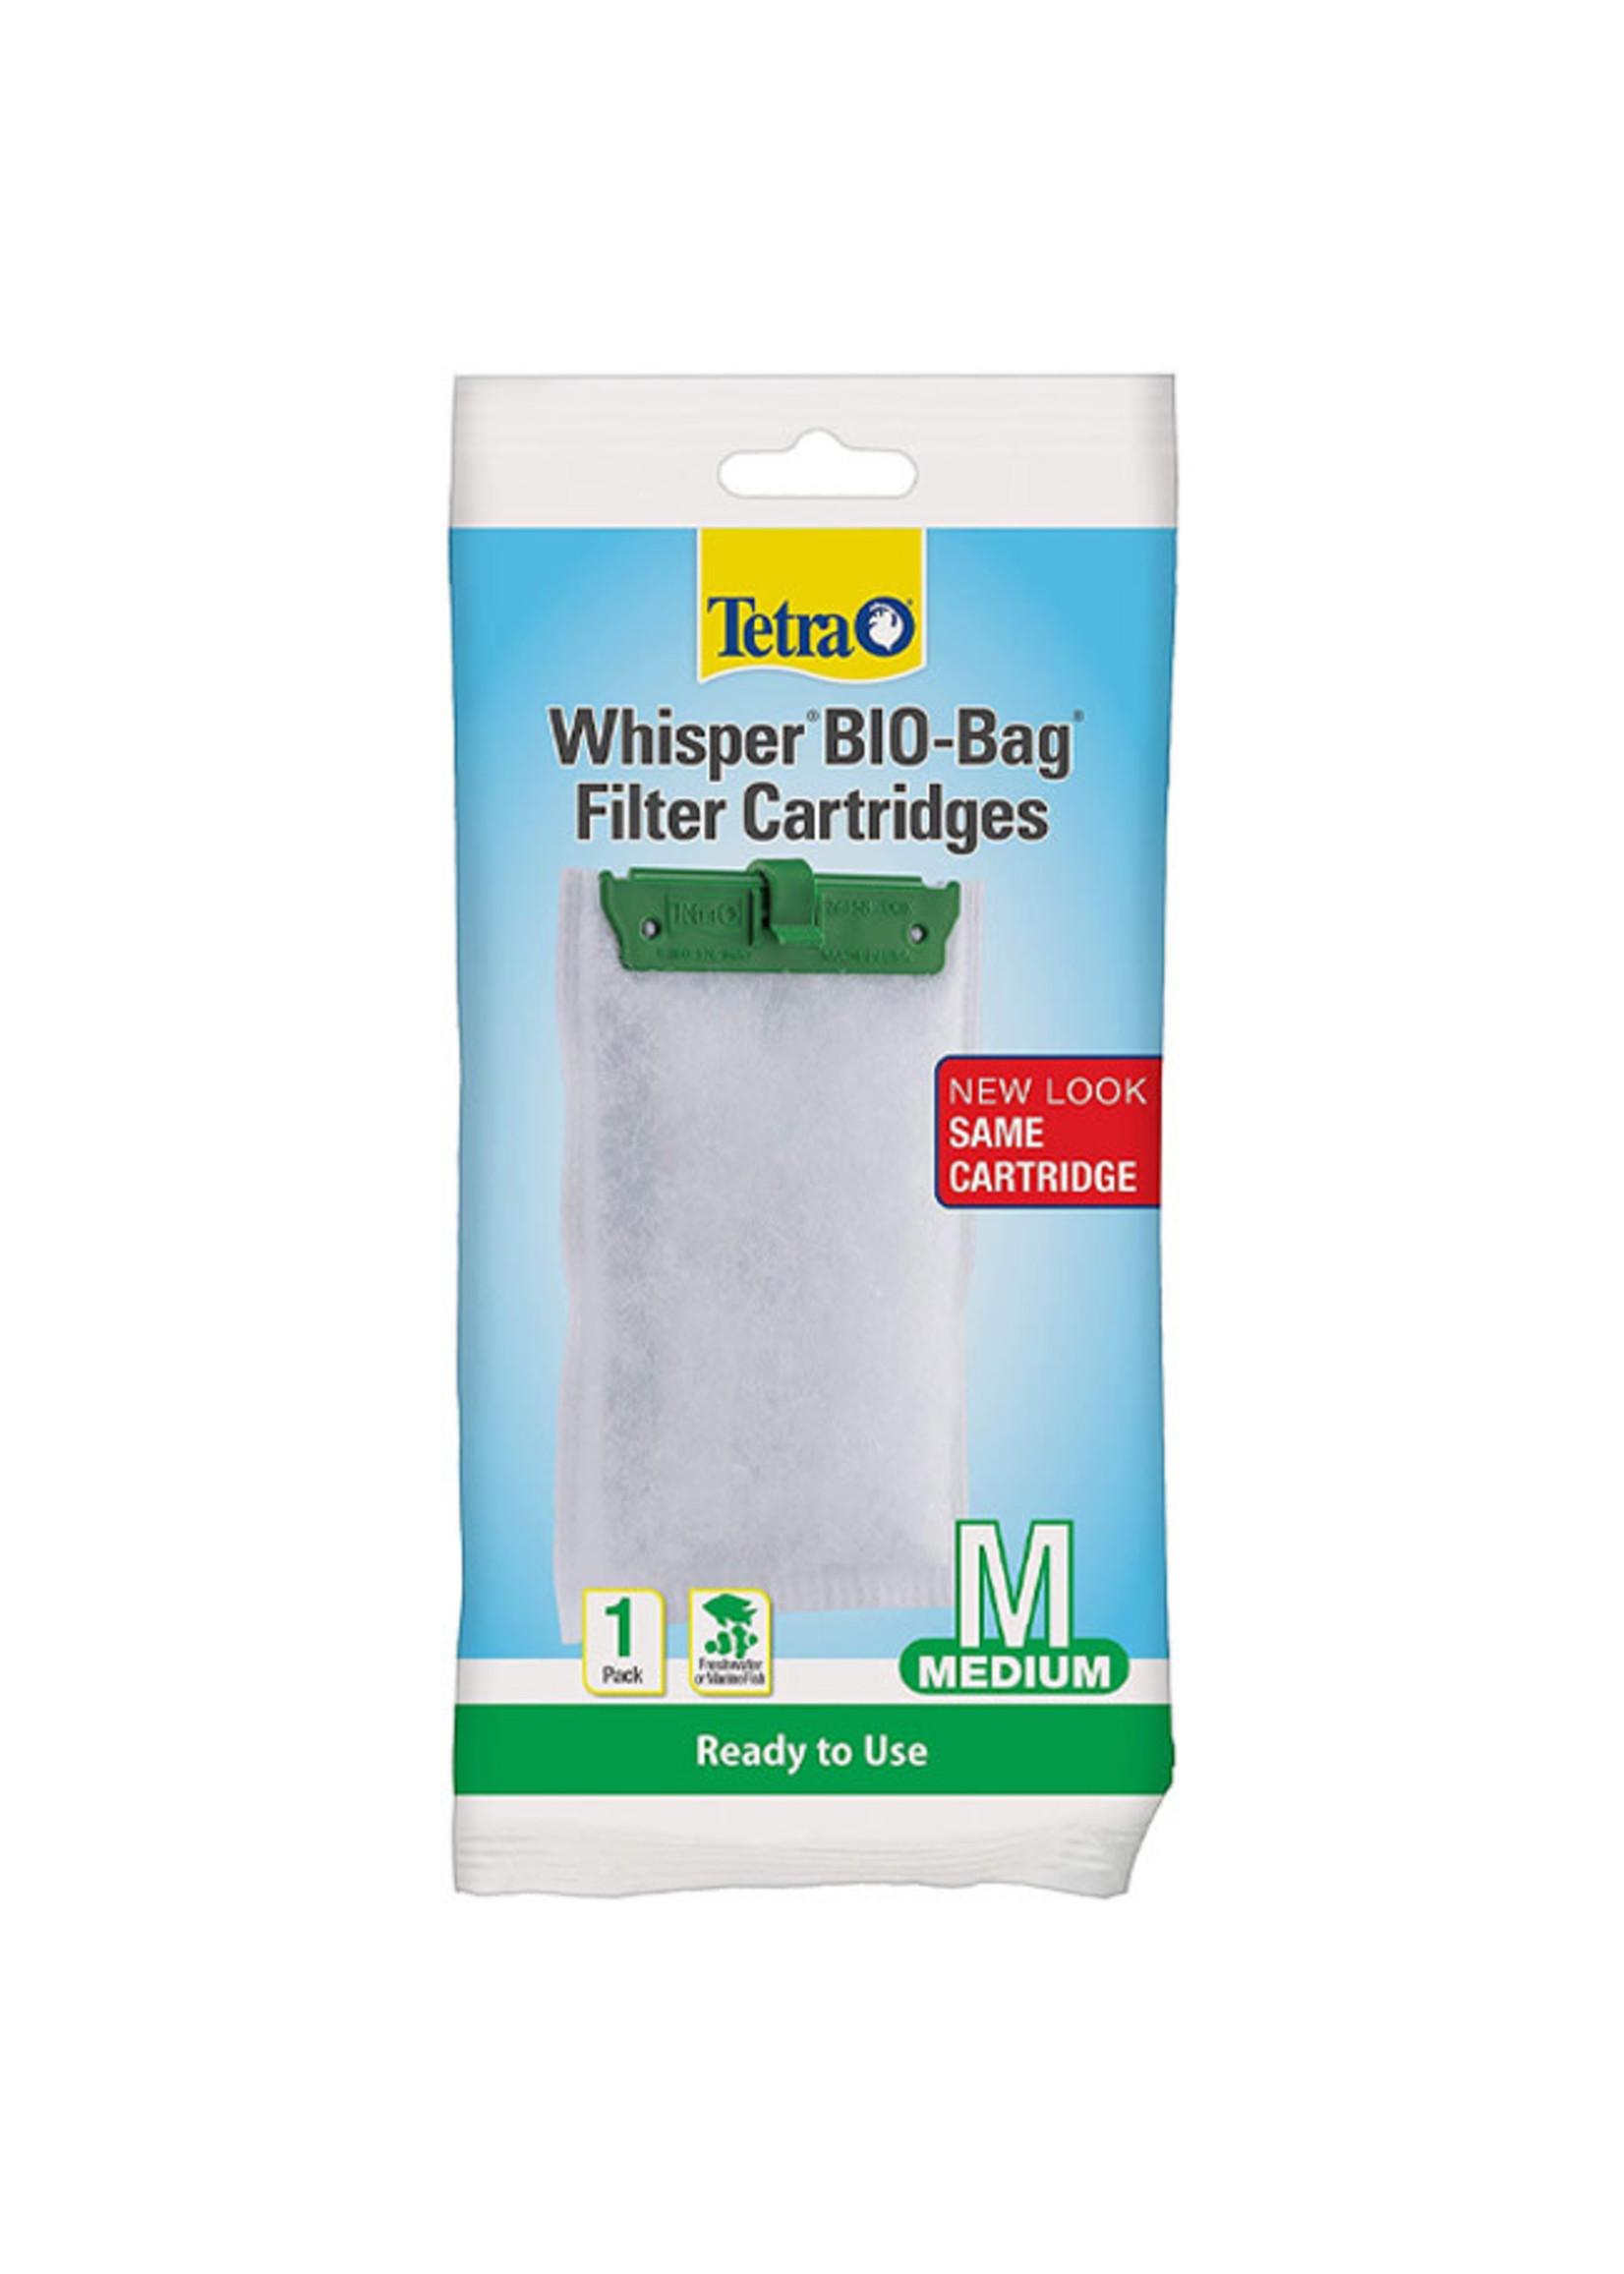 SPECTRUM BRANDS - TETRA Tetra Whisper BIO-Bag  Filter Cartridges Ready to Use